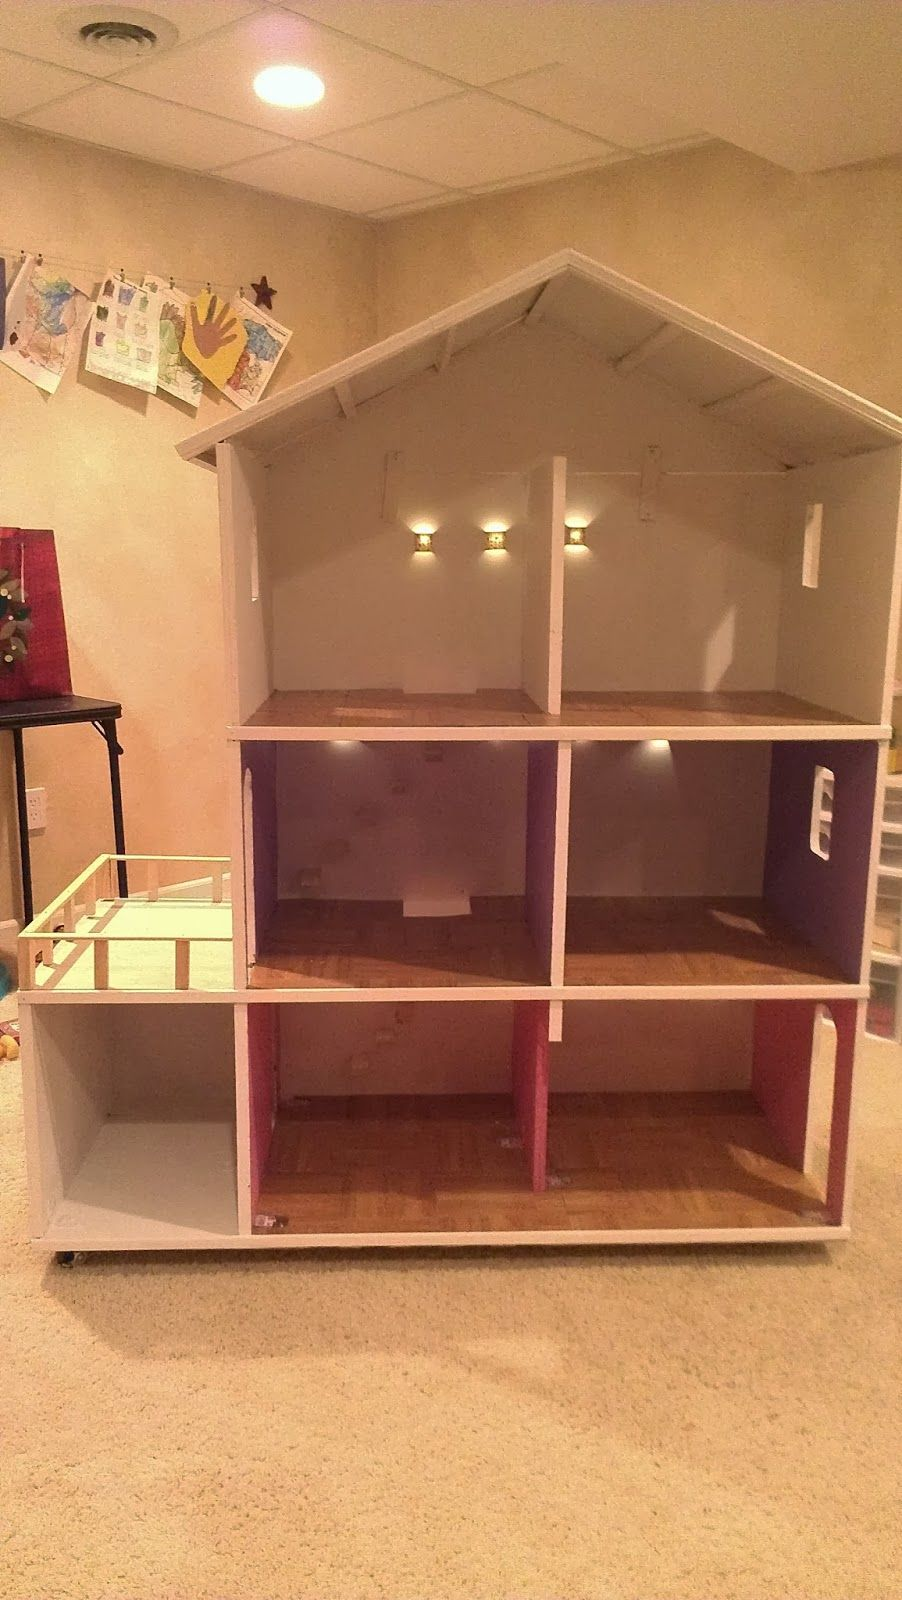 Deann S Creative Corner Barbie House Diy My Blog Post